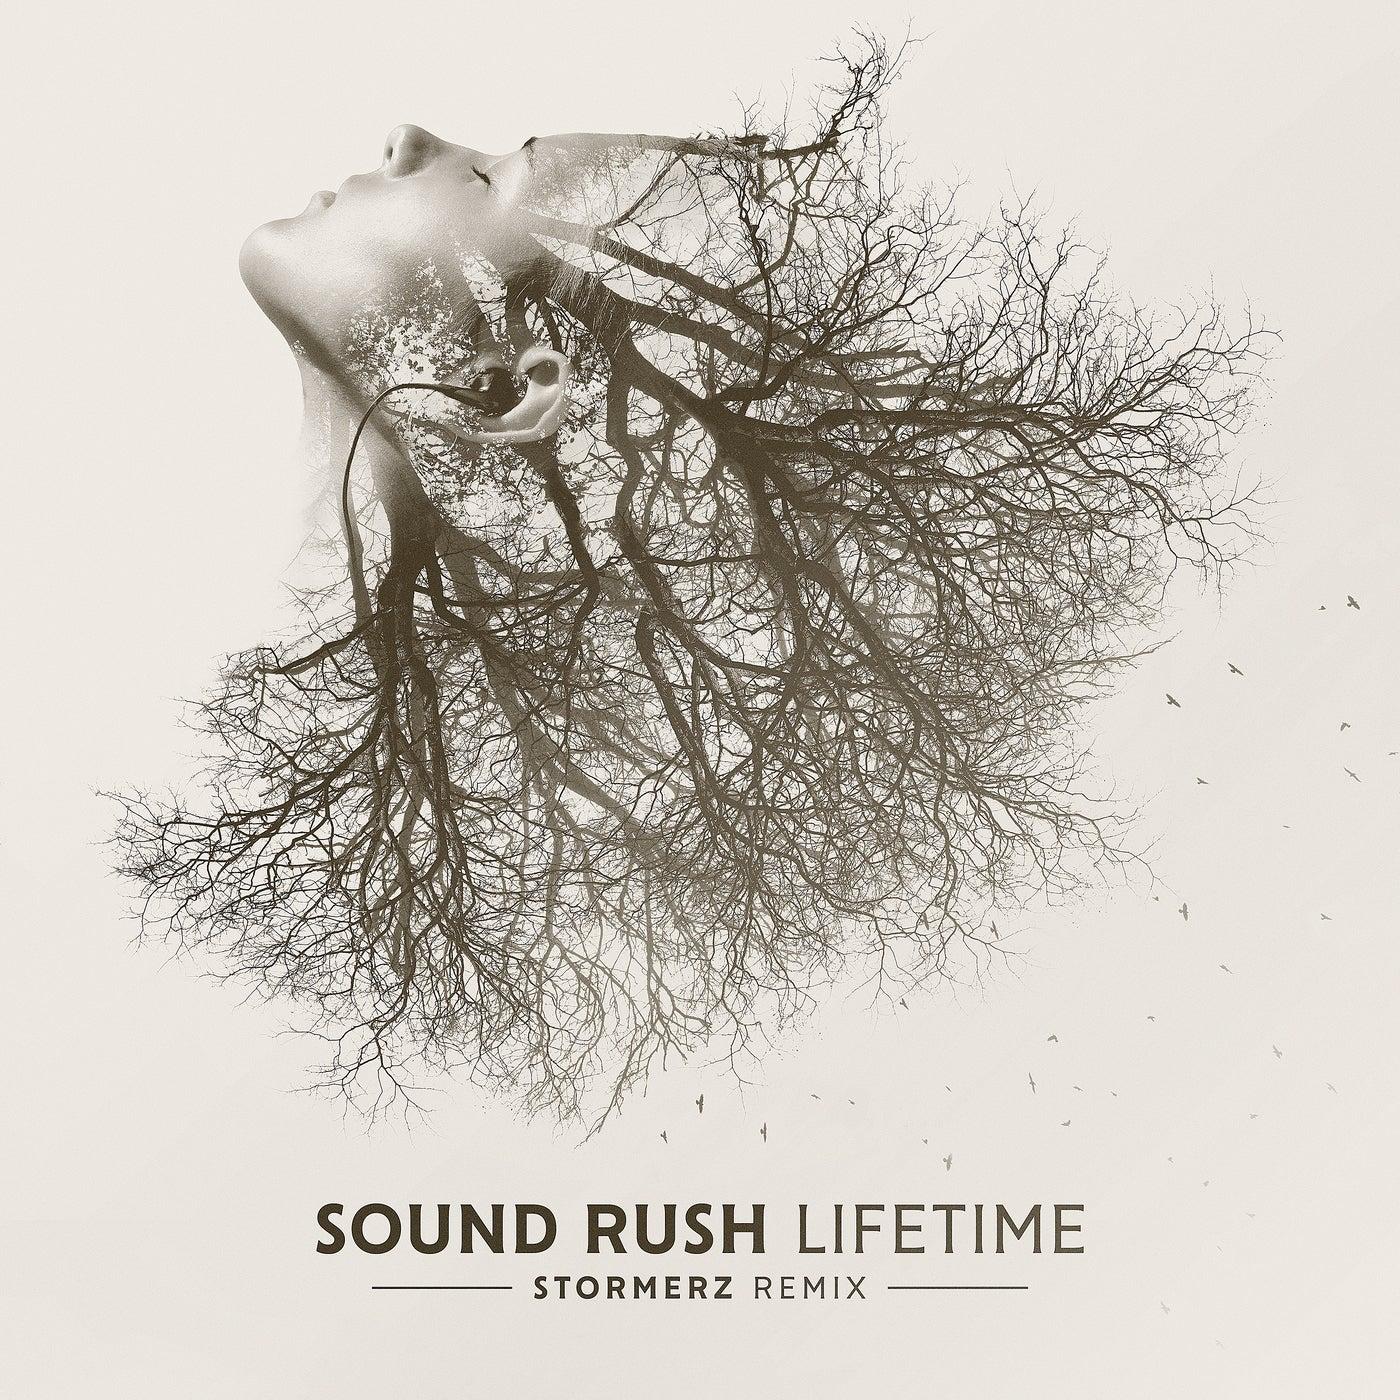 Lifetime (Stormerz Extended Remix)